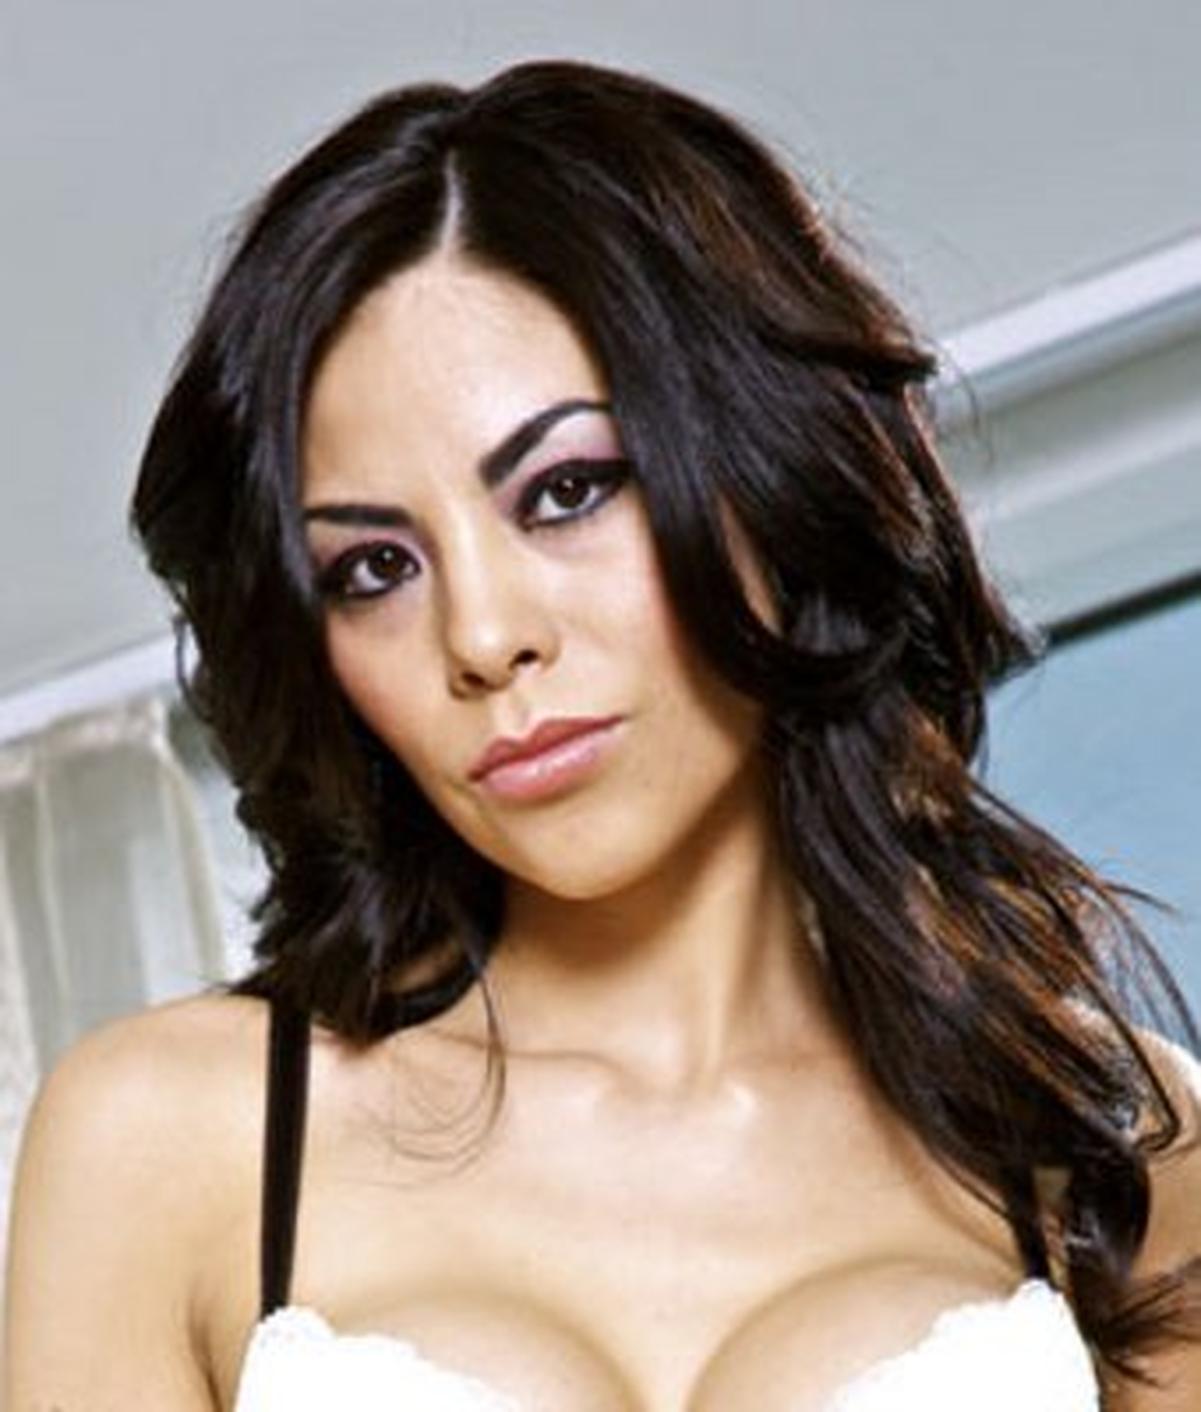 Makayla Marie